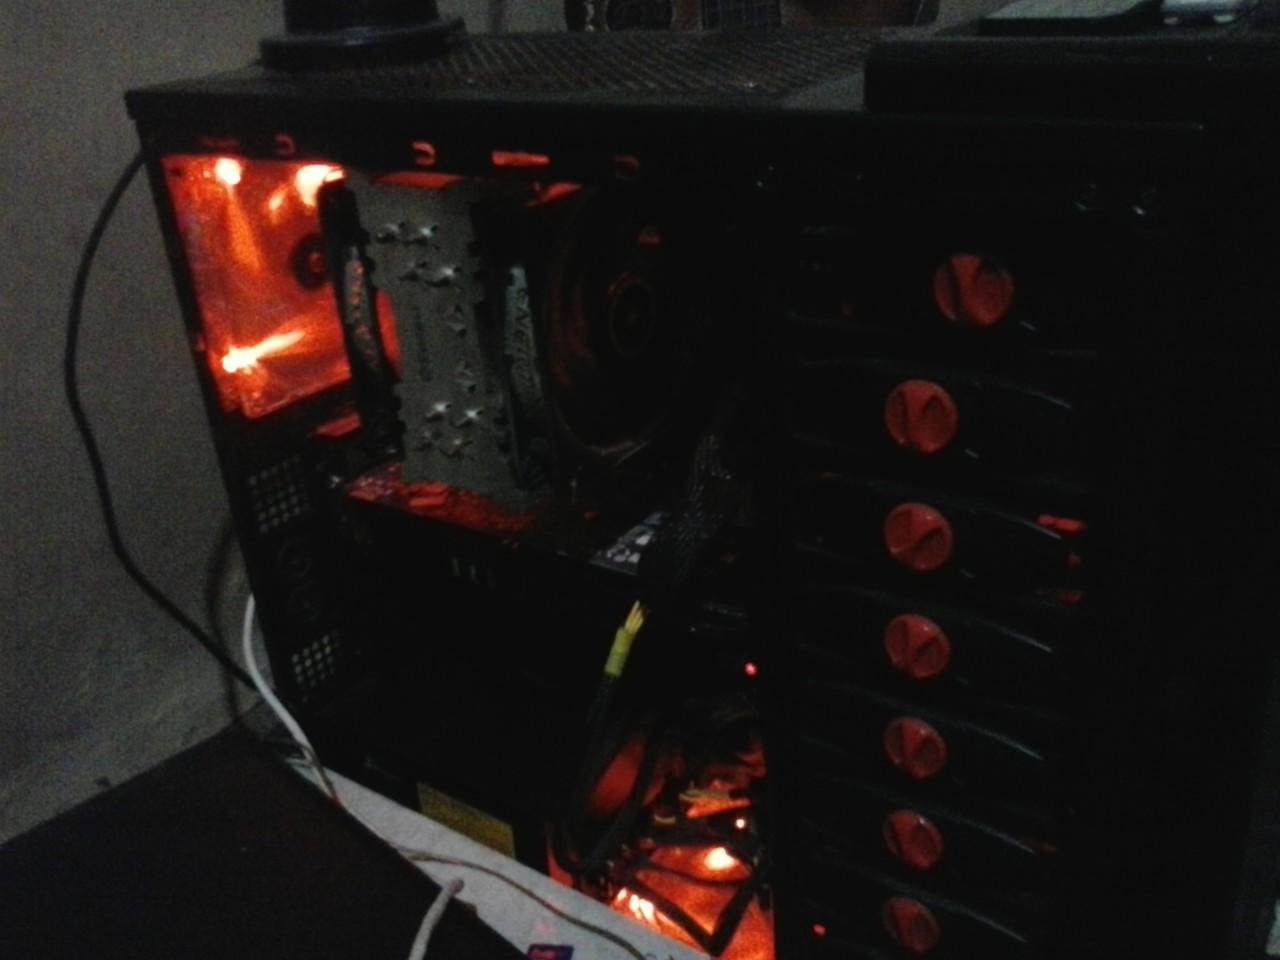 JUAL CASING PC GAMING VENOMRX KING COBRA FULL SET